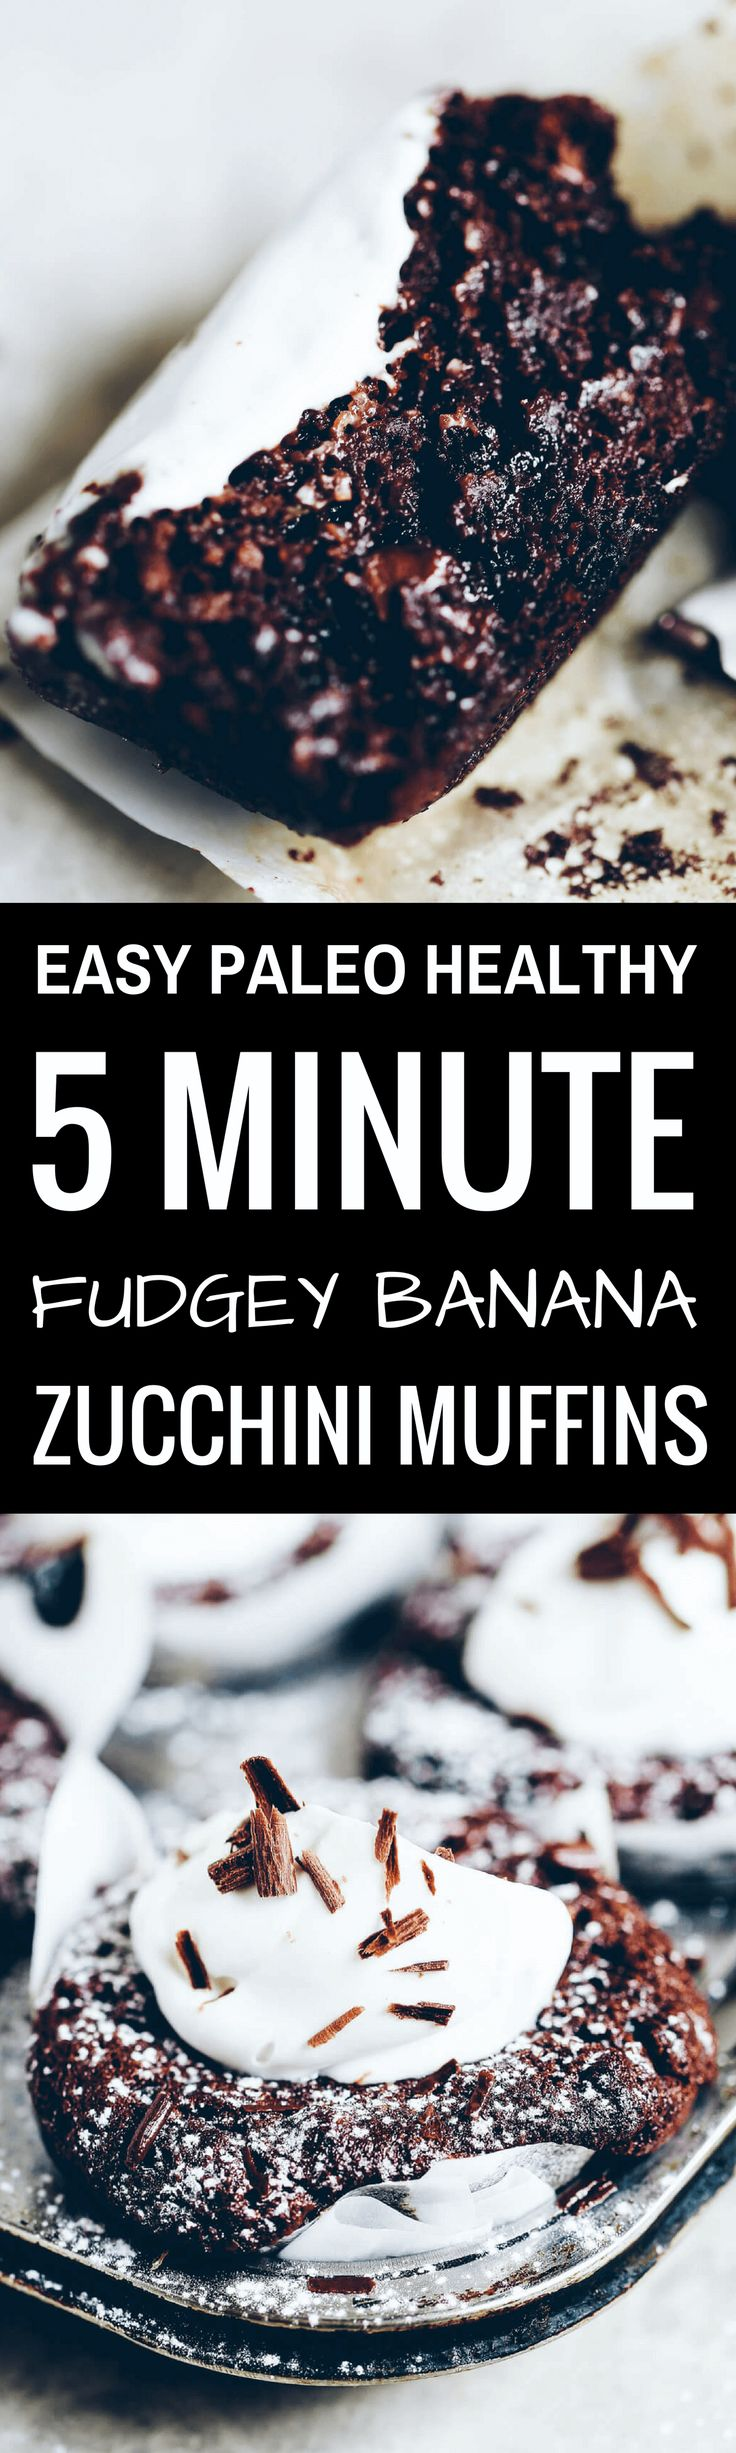 Fudgey flourless and paleo zucchini muffins. Made with ground hazelnuts (or almond flour), banana, and zucchini! Naturally gluten free, dairy free.